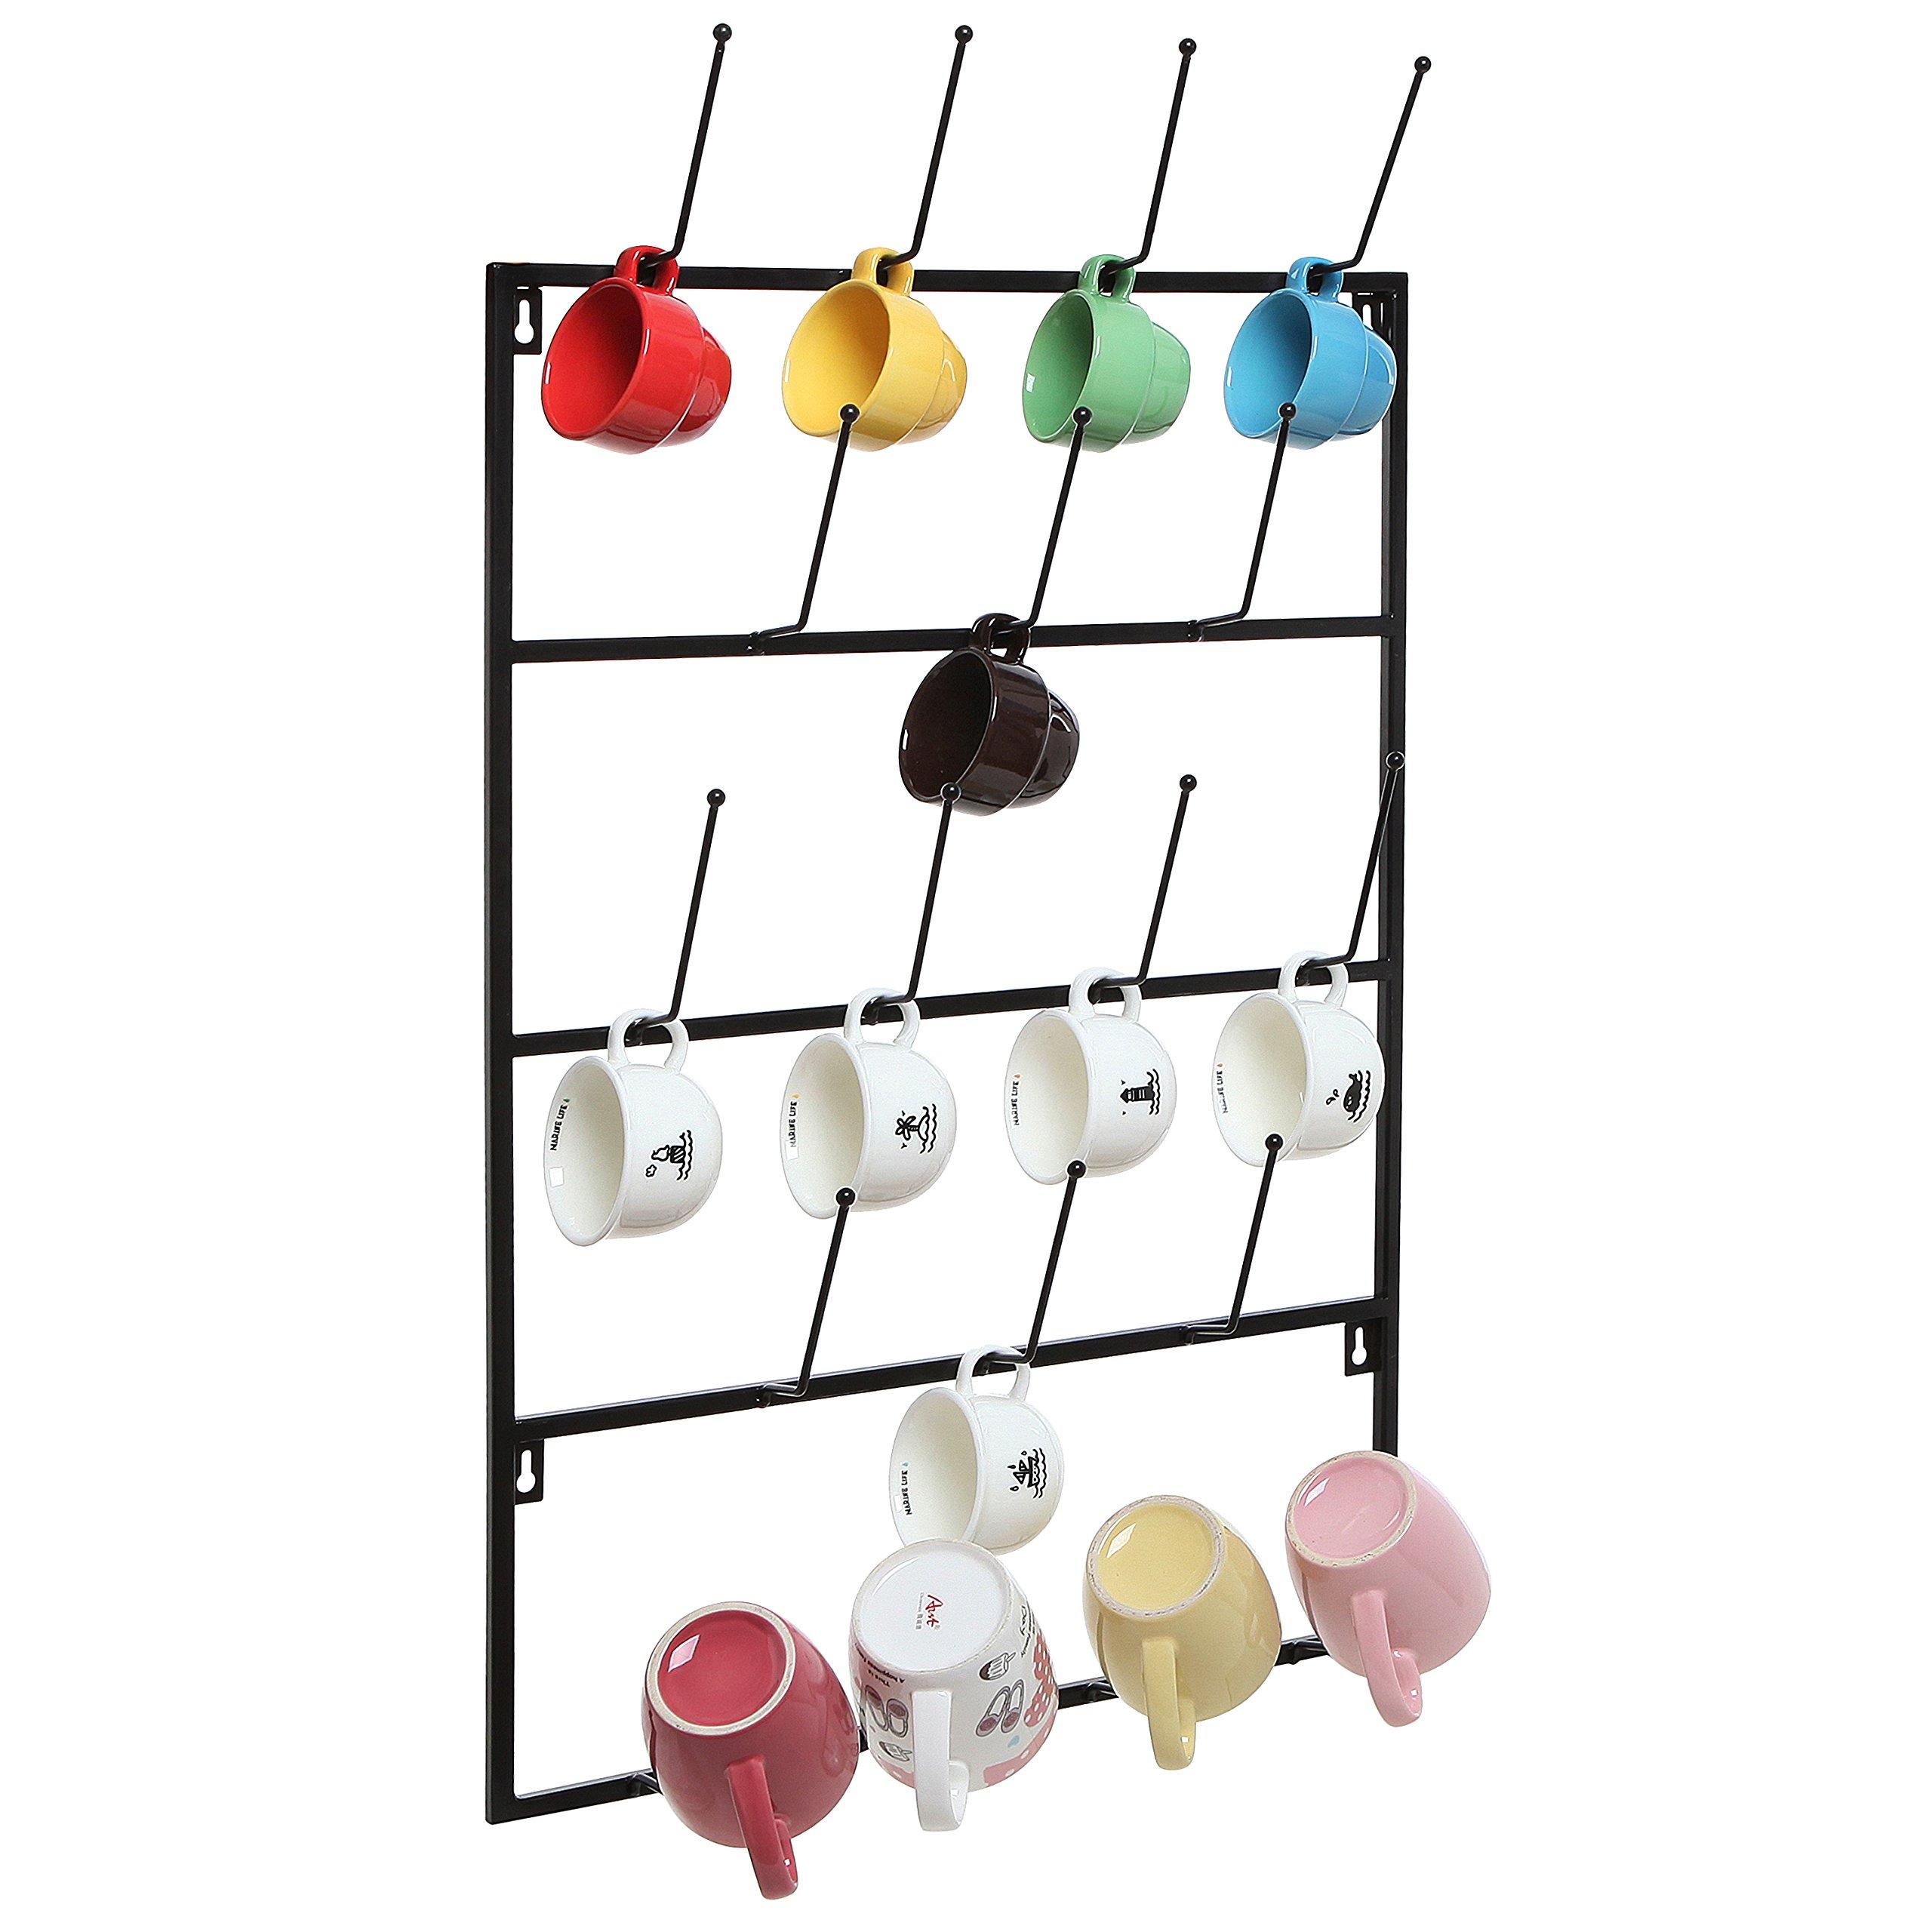 5 Tier Black Metal Wall Mounted Kitchen Mug Hook Display/Cup Storage Organizer Hanger Rack - MyGift by MyGift